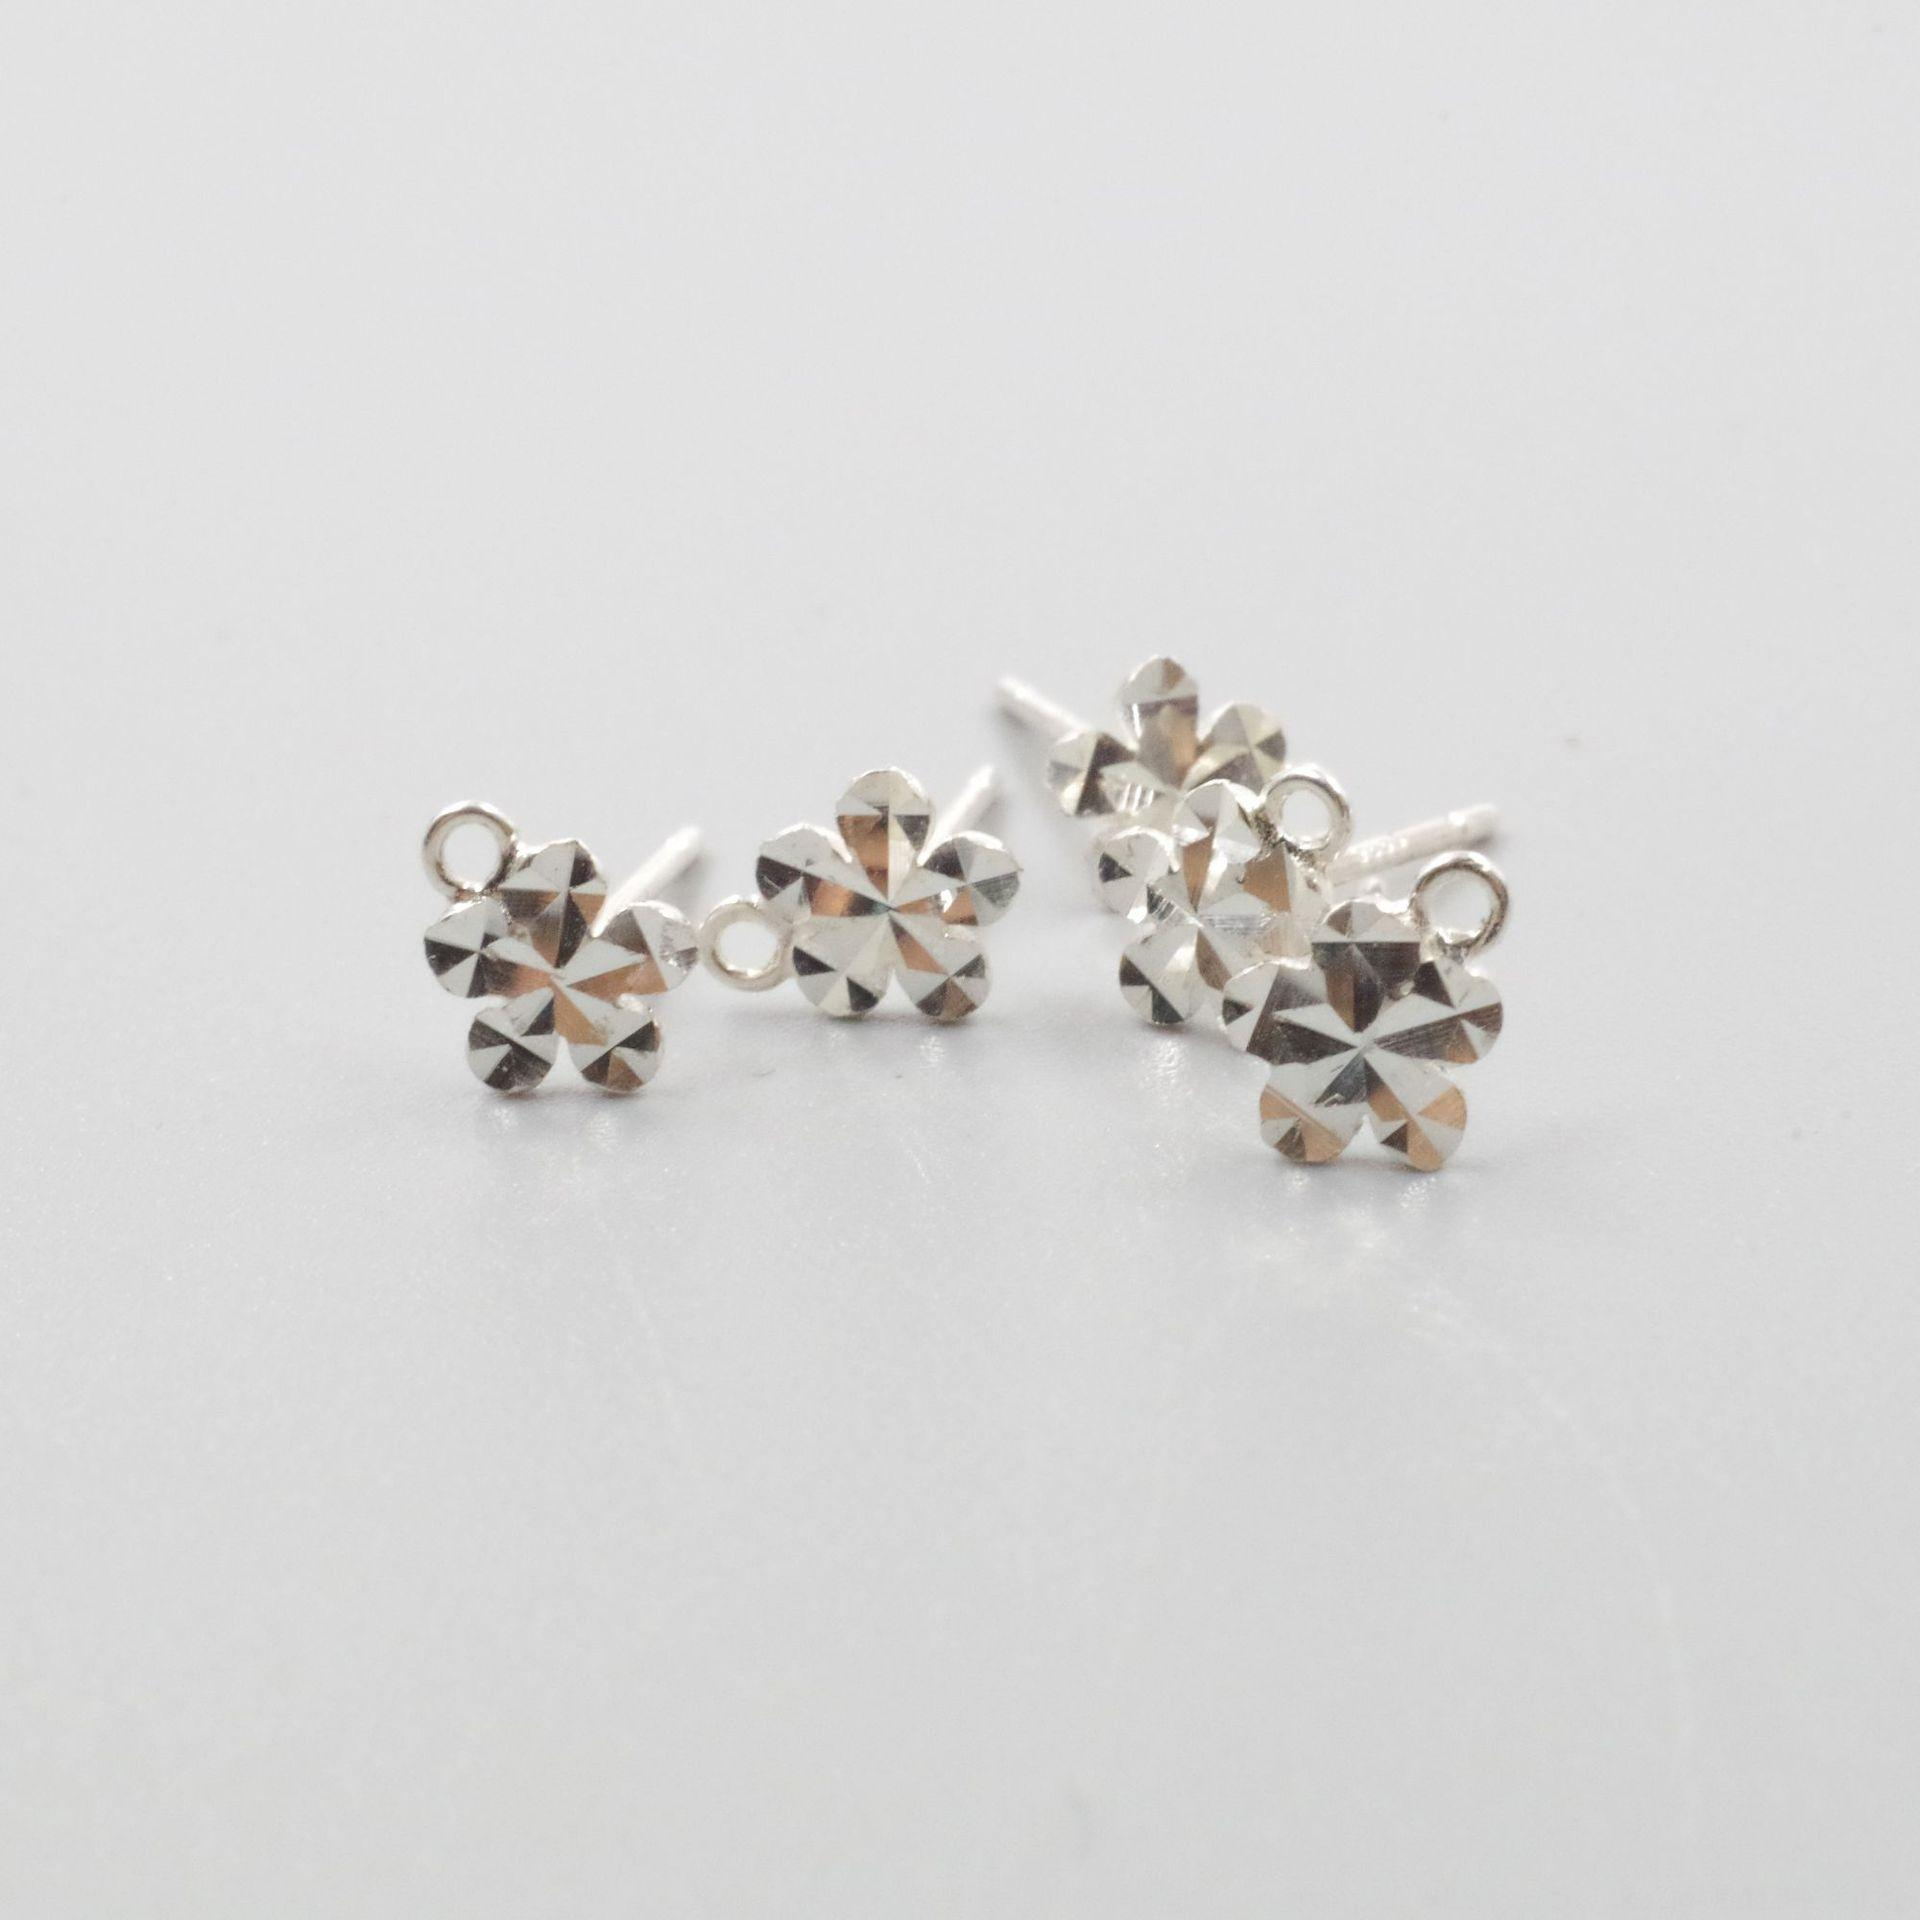 MuhBJ S925 Sterling Ohrringe DIY Blume Ohrringe Silber Auto Blume Pflaume Ohrbolzen Plus Ring DIY Ohr japanische Gestüt und koreanischen Stil Mode pe